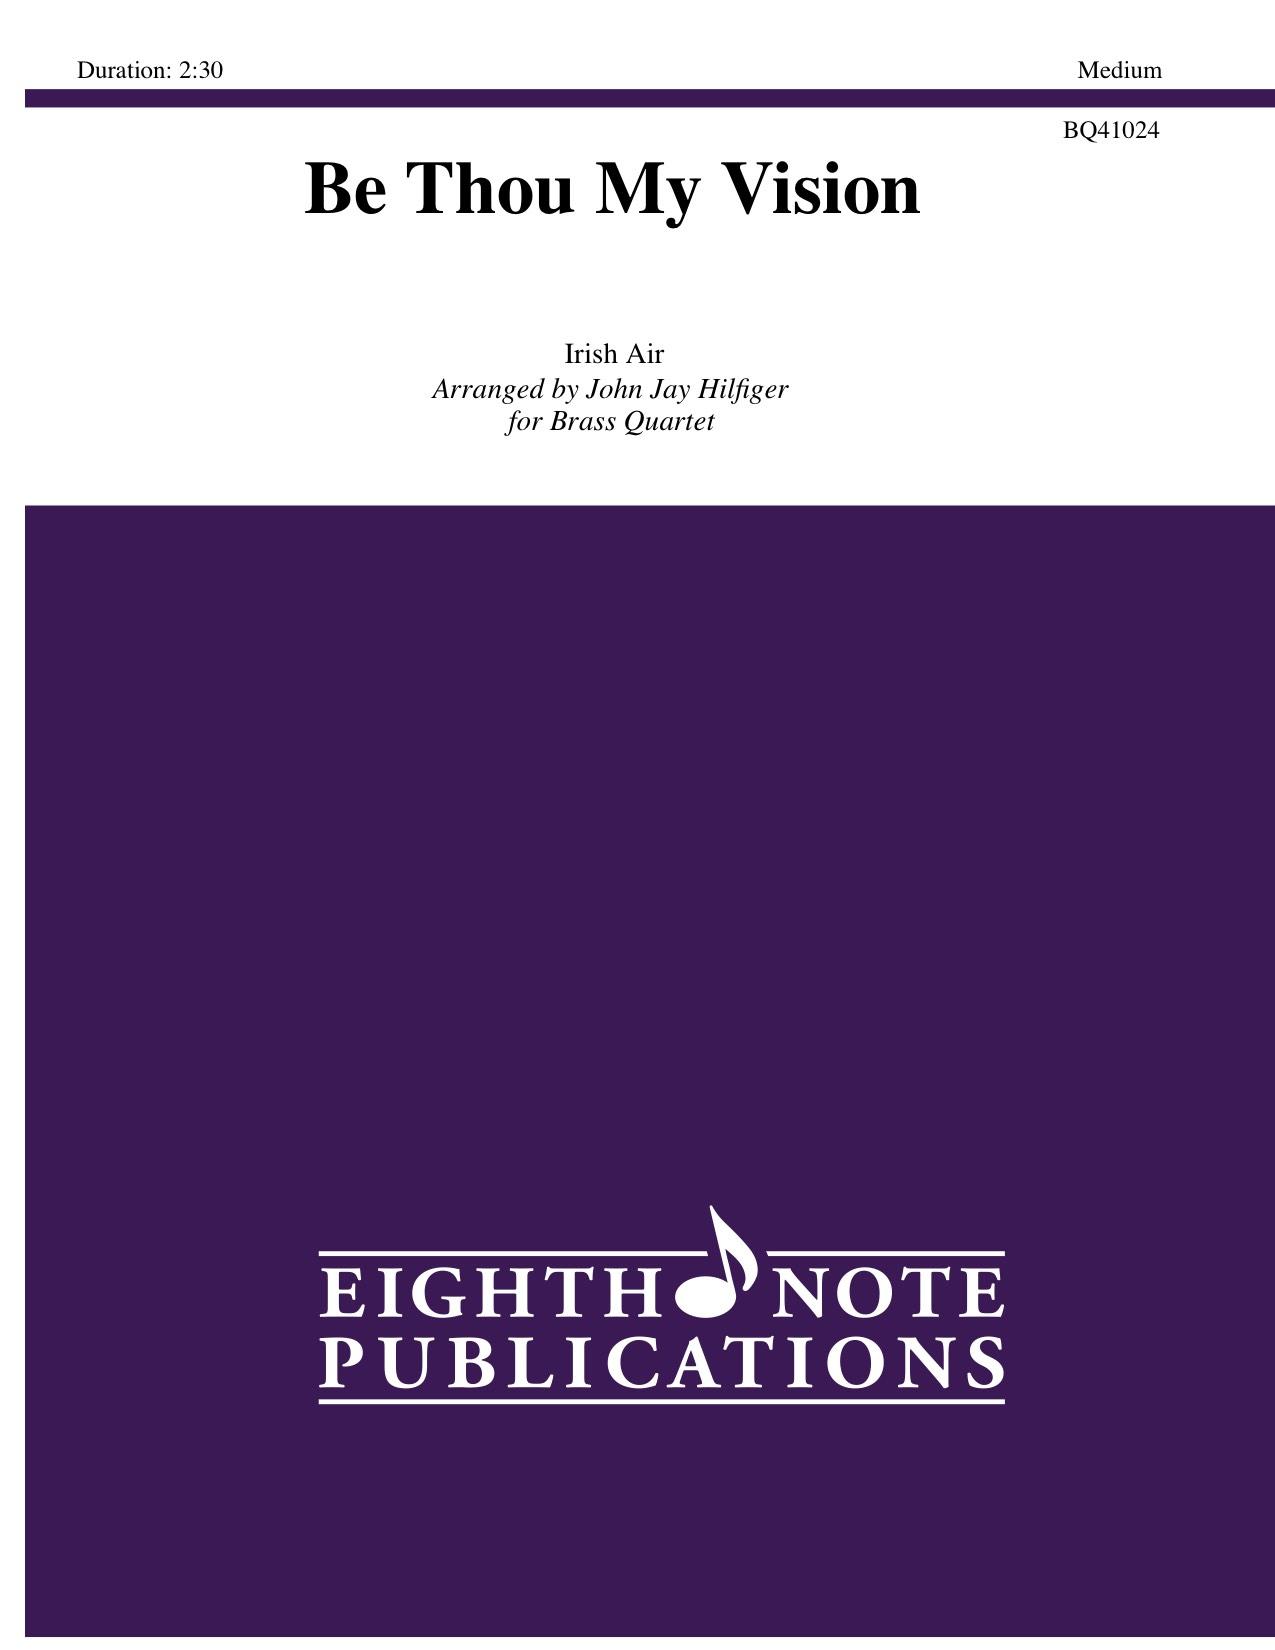 Be Thou My Vision -  Irish Air